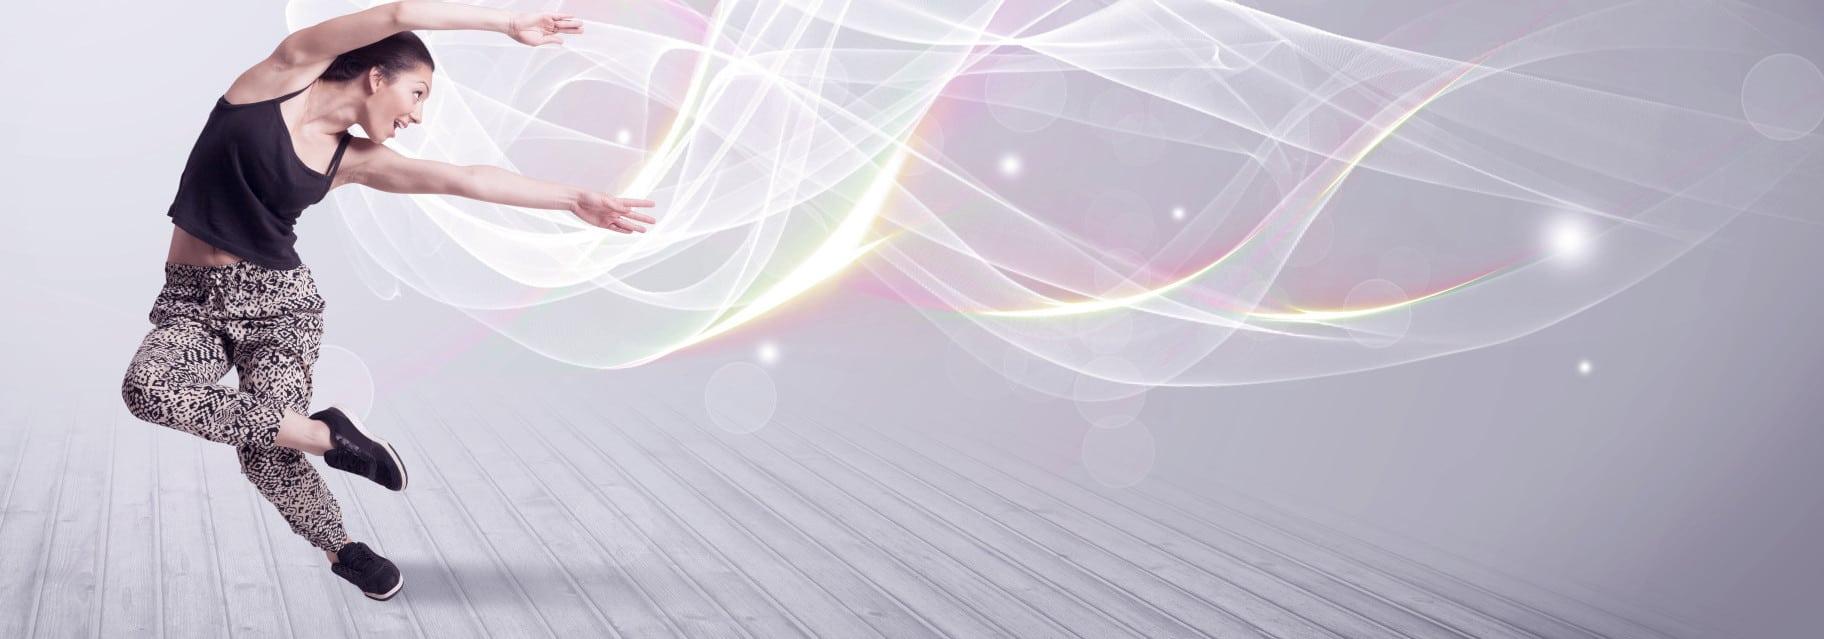 Dance Insurance Image